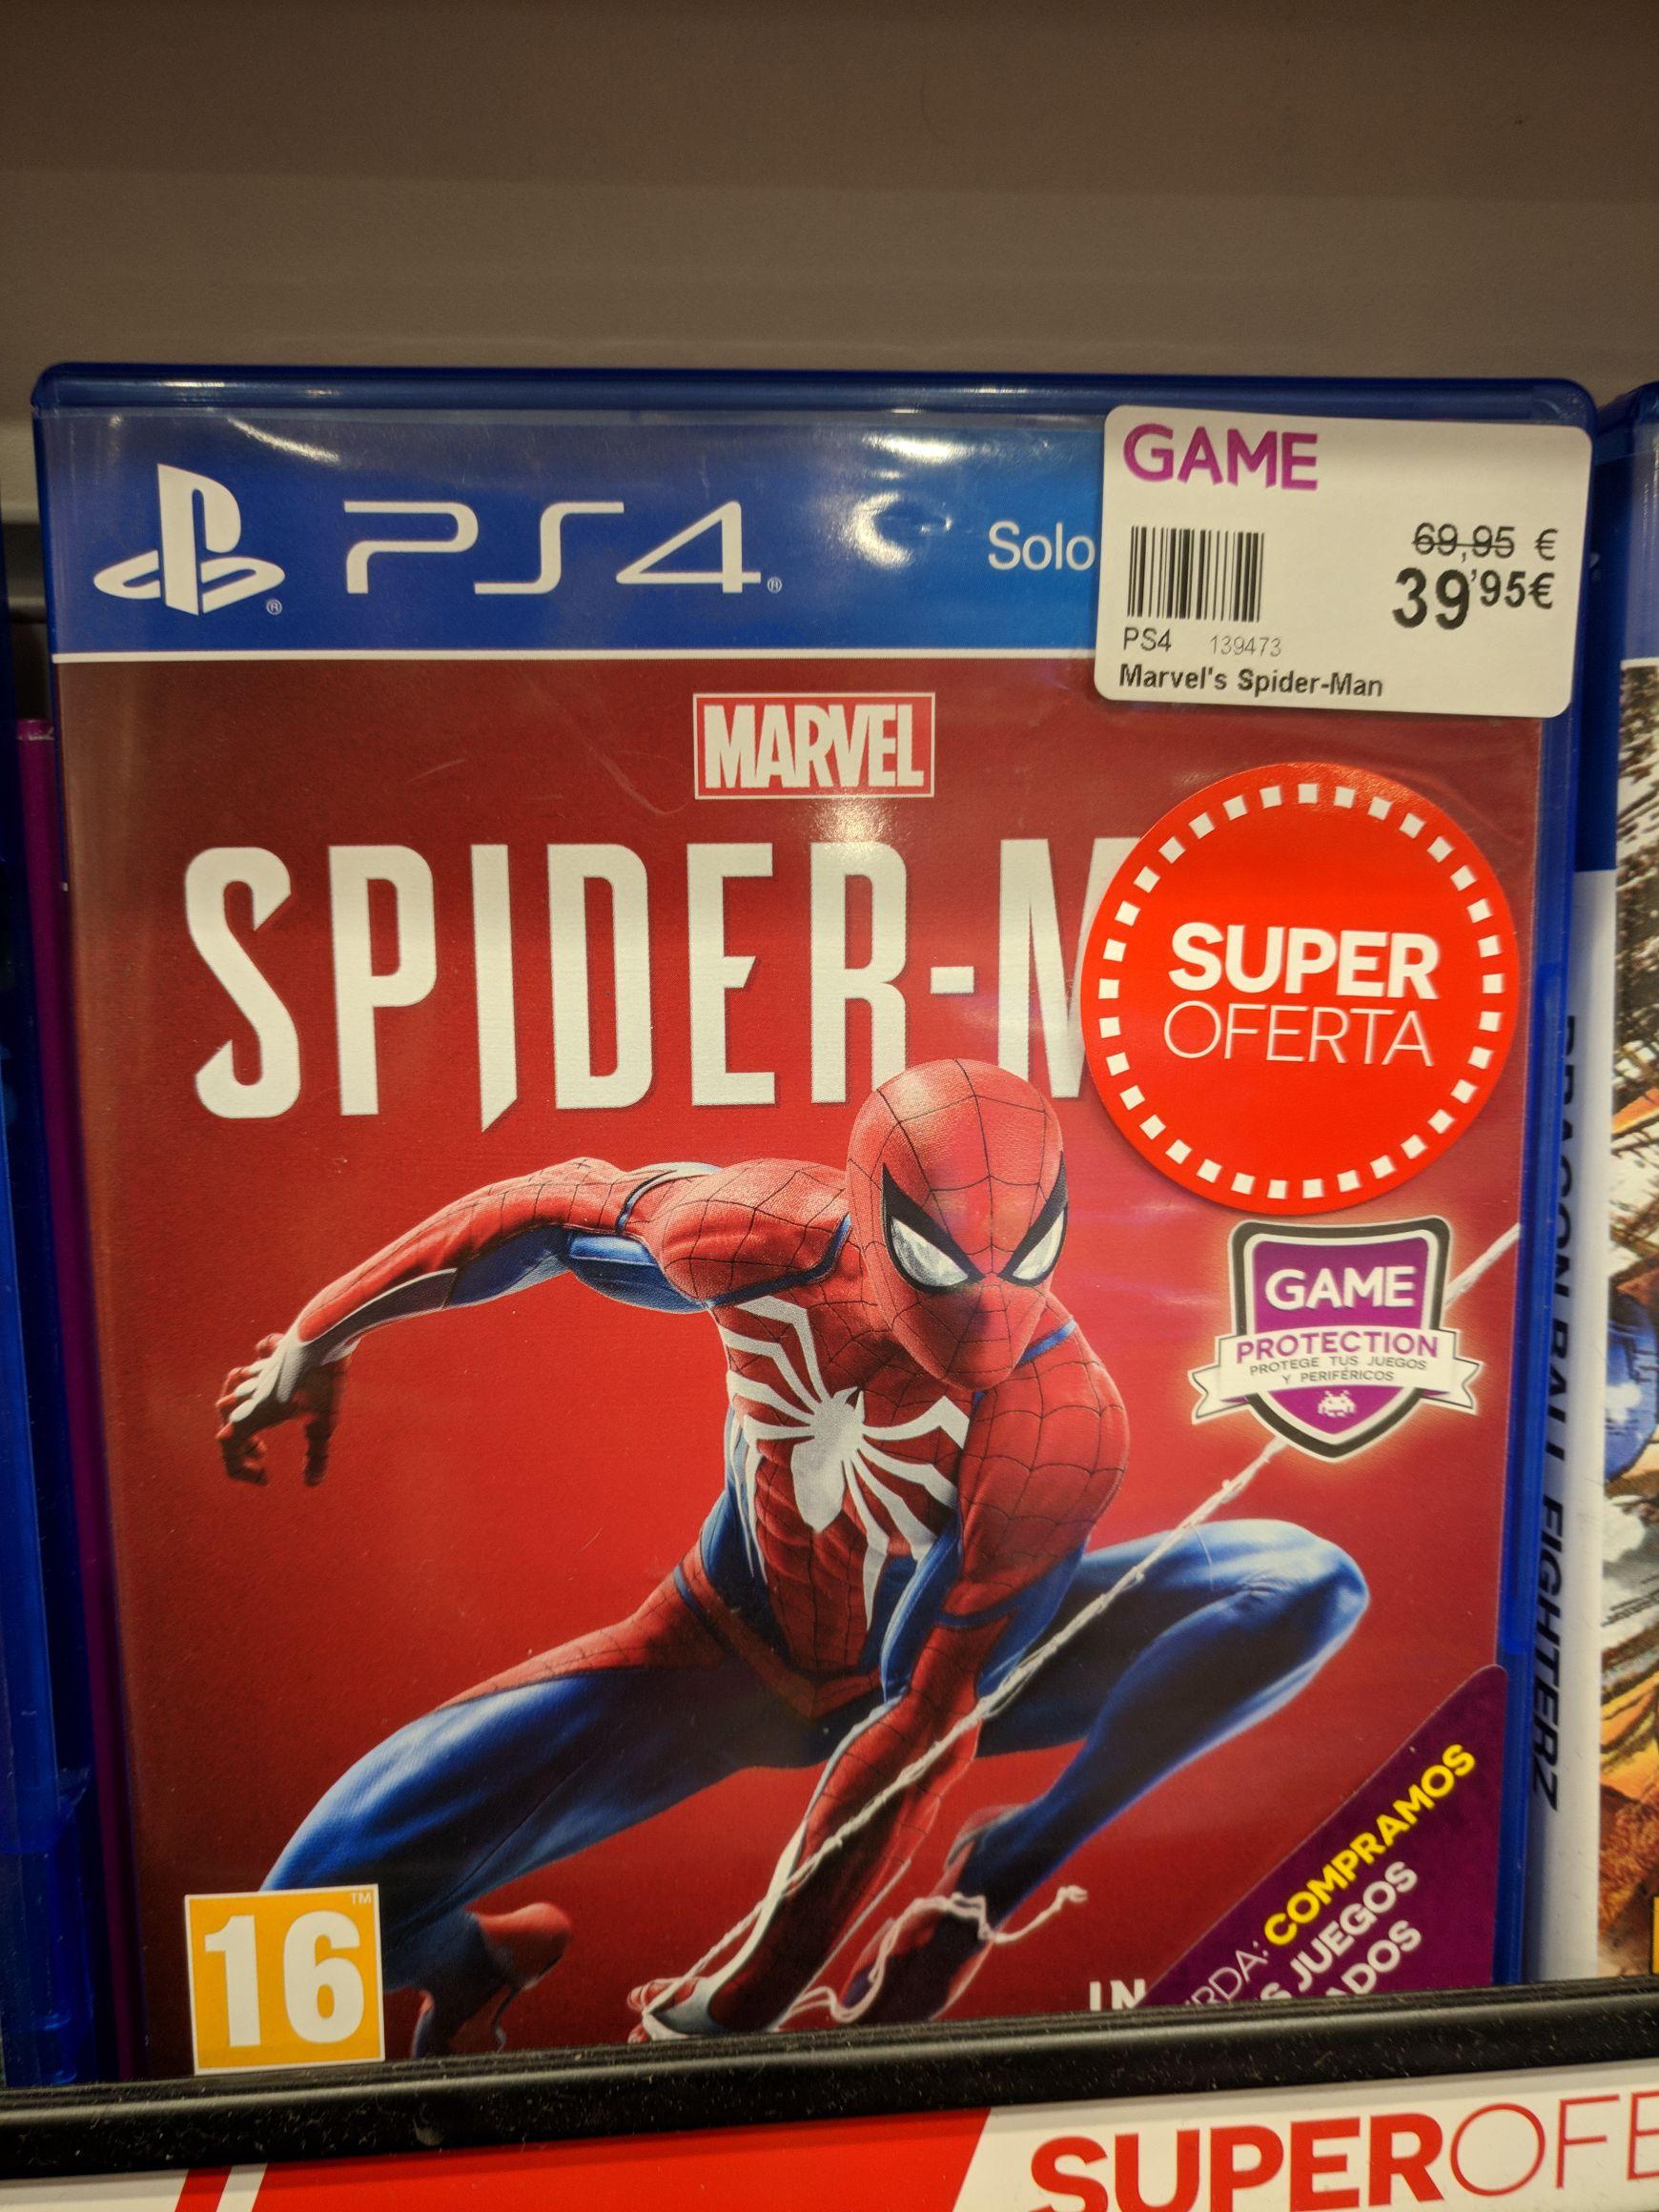 Marvels Spider-man en tiendas Game PS4